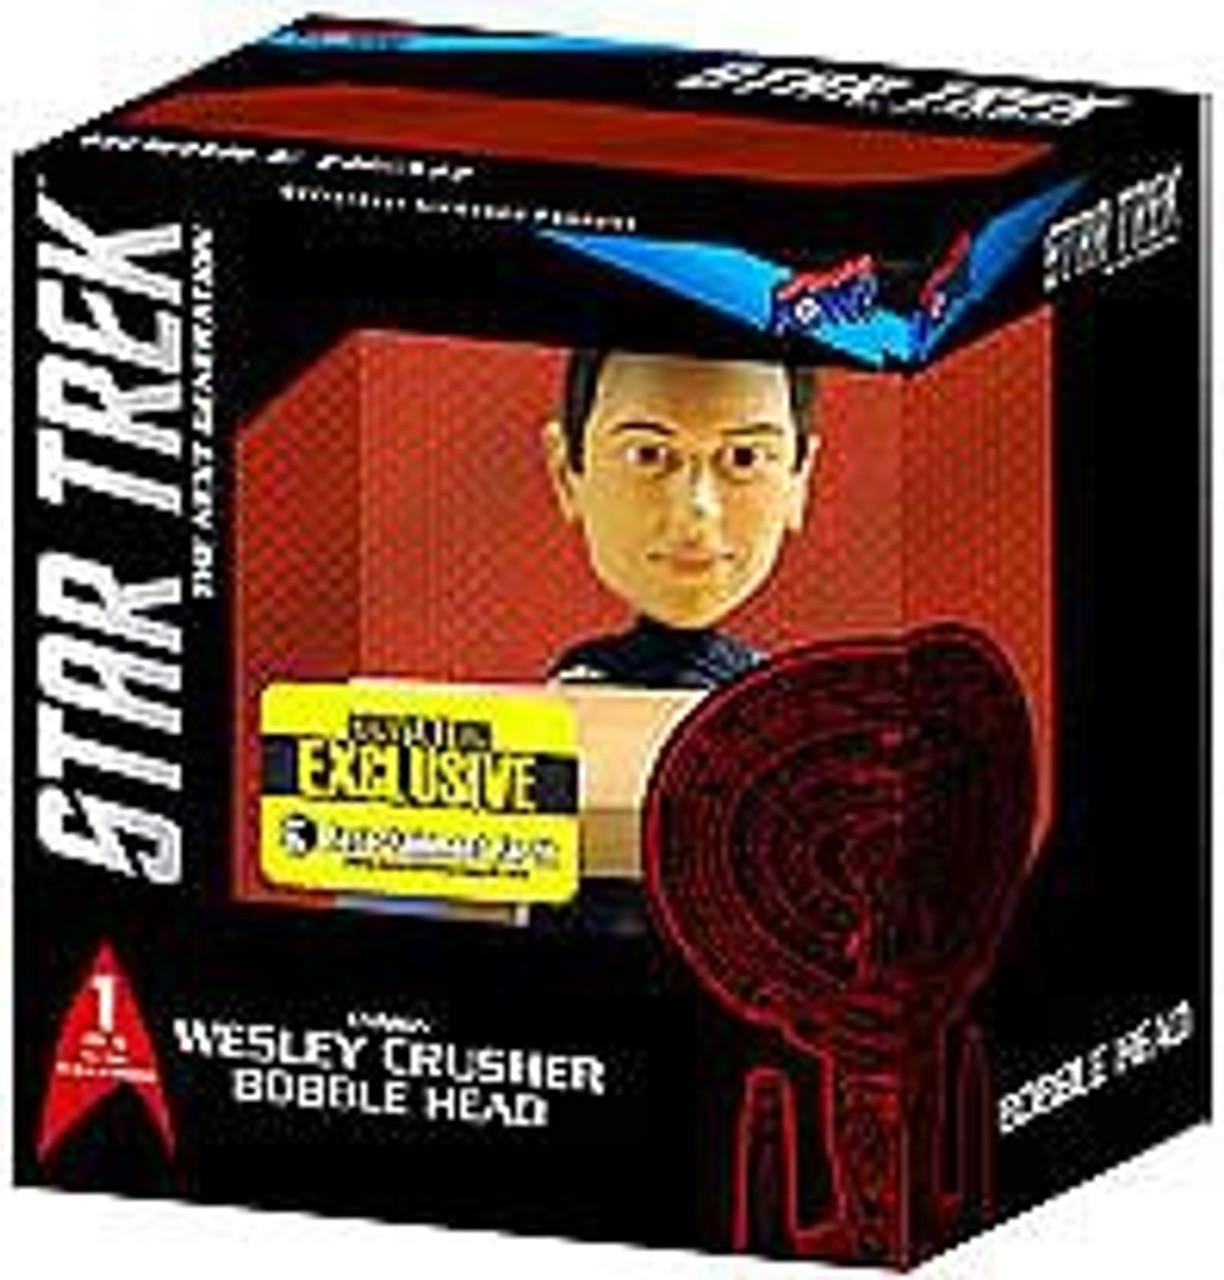 Star Trek The Next Generation Build a Bridge Wesley Crusher Exclusive 7-Inch Bobble Head